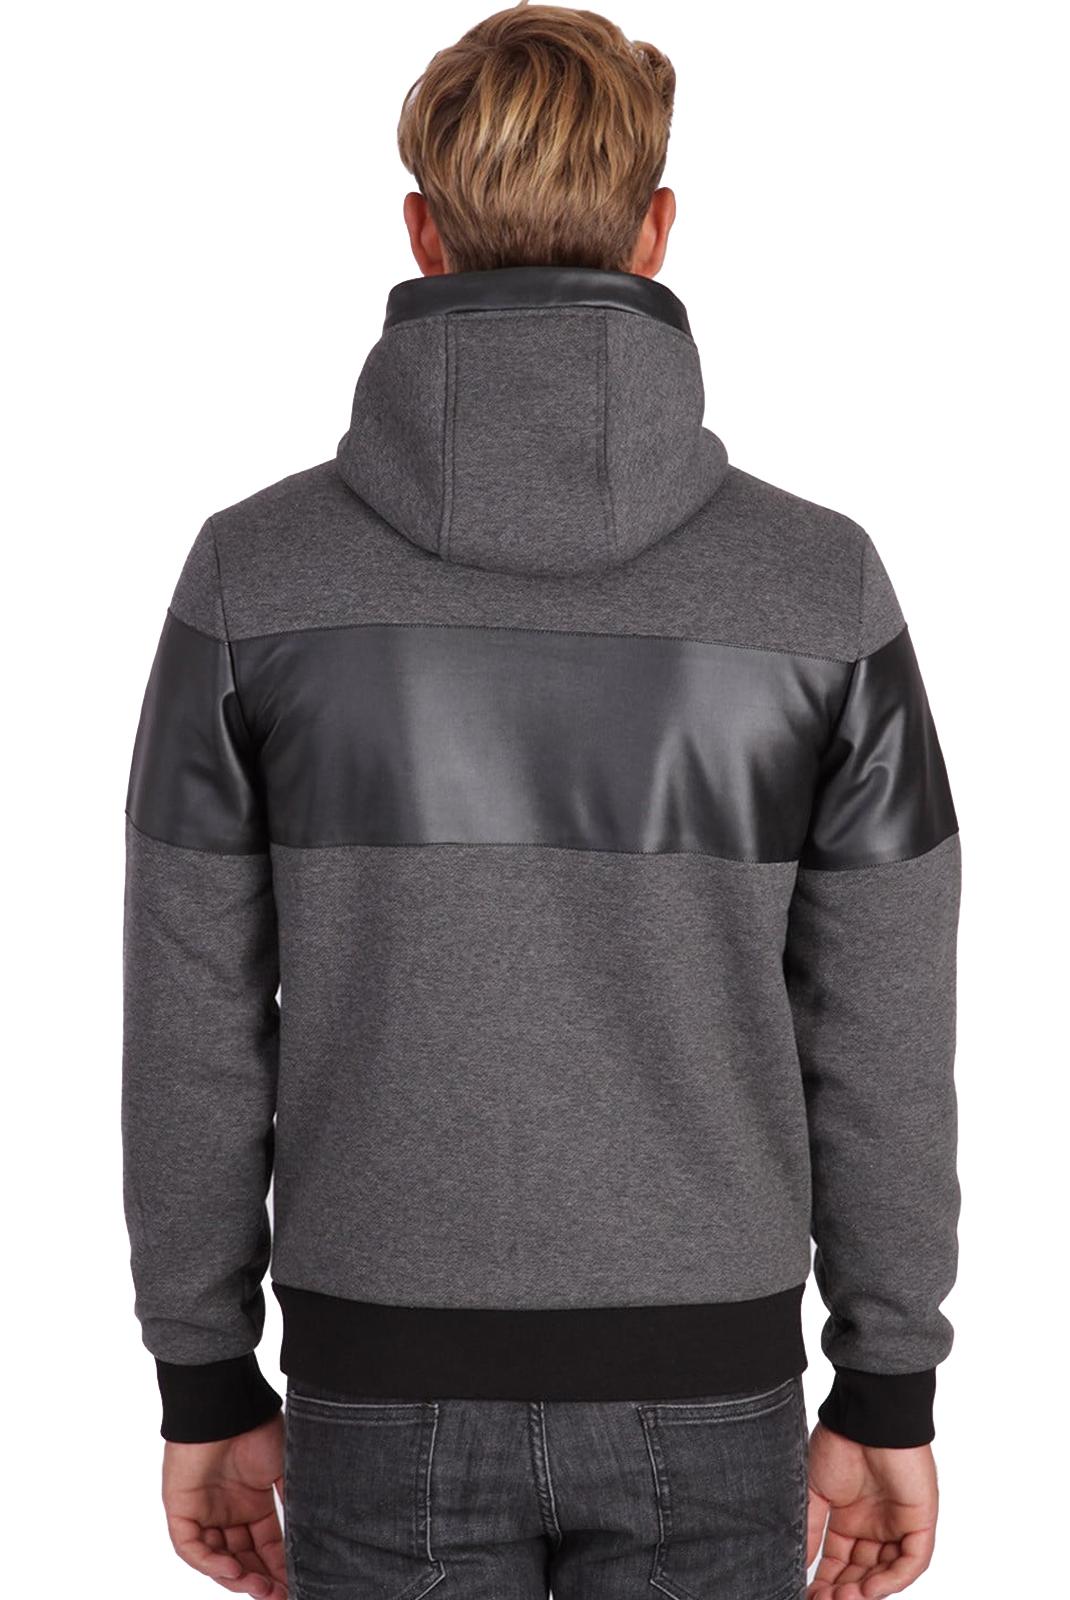 Vestes zippées  Kaporal MAFIA Dark grey melanged